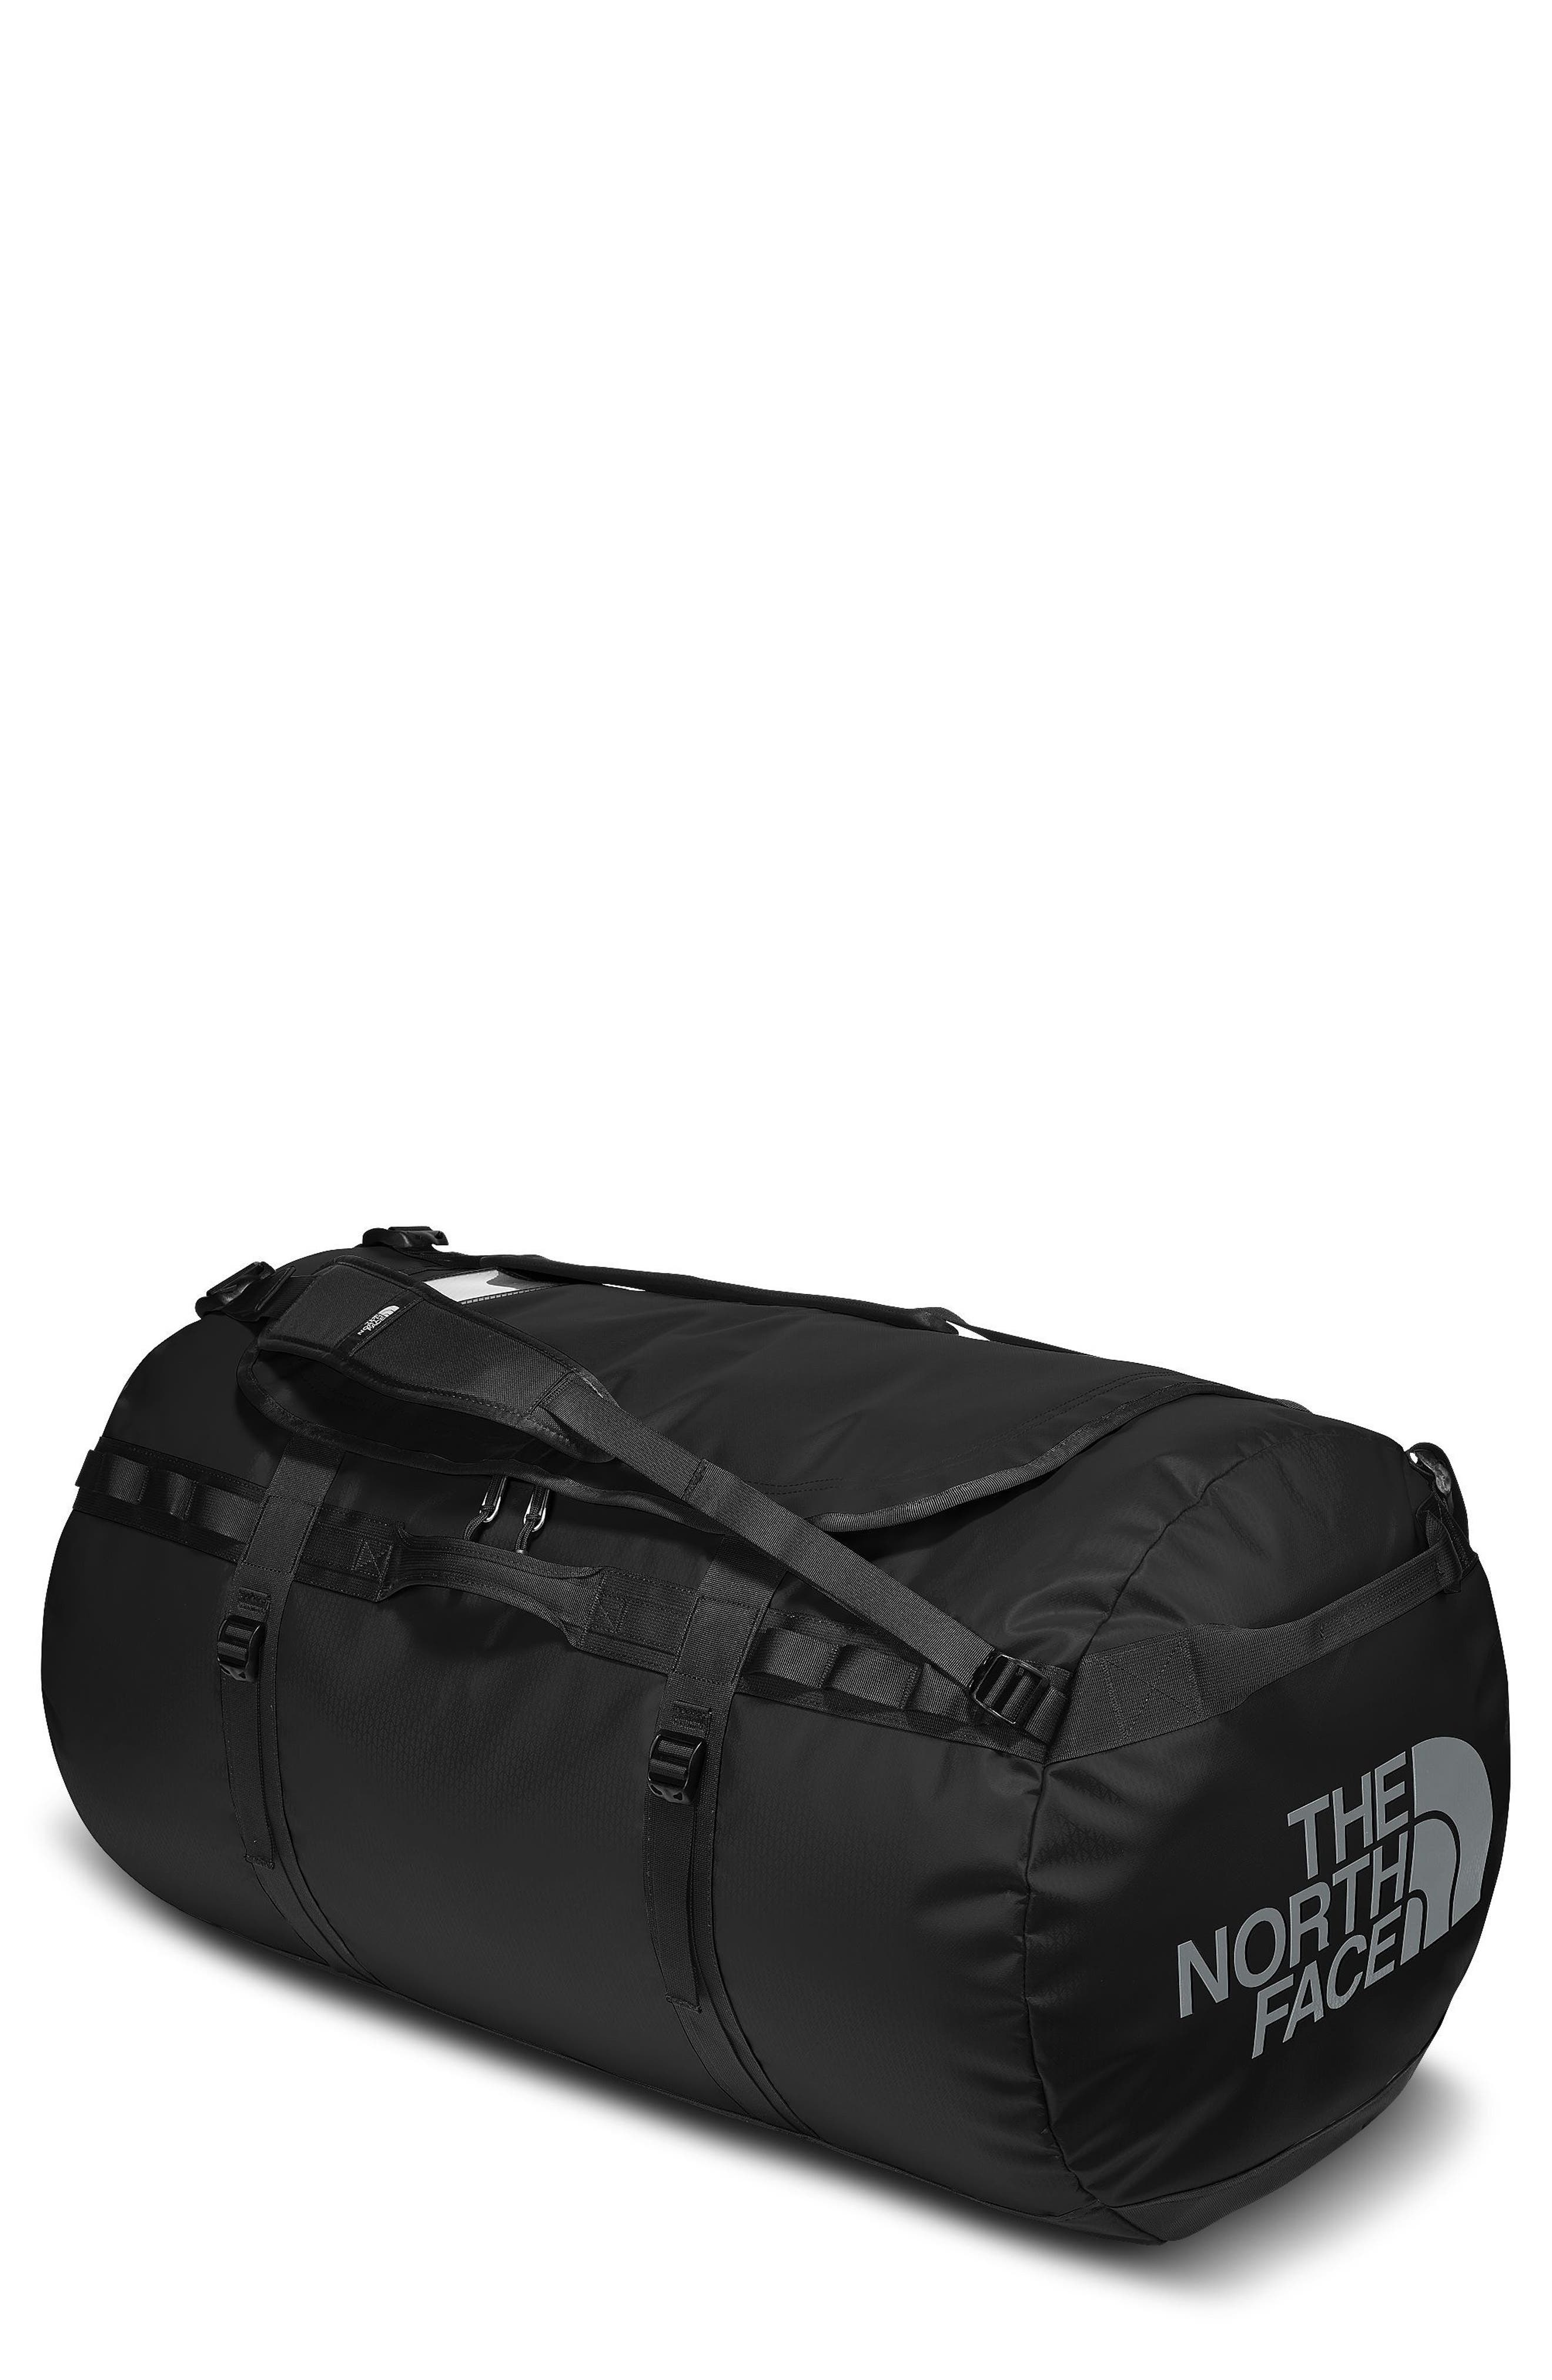 Base Camp XXL Duffel Bag,                             Main thumbnail 1, color,                             Tnf Black